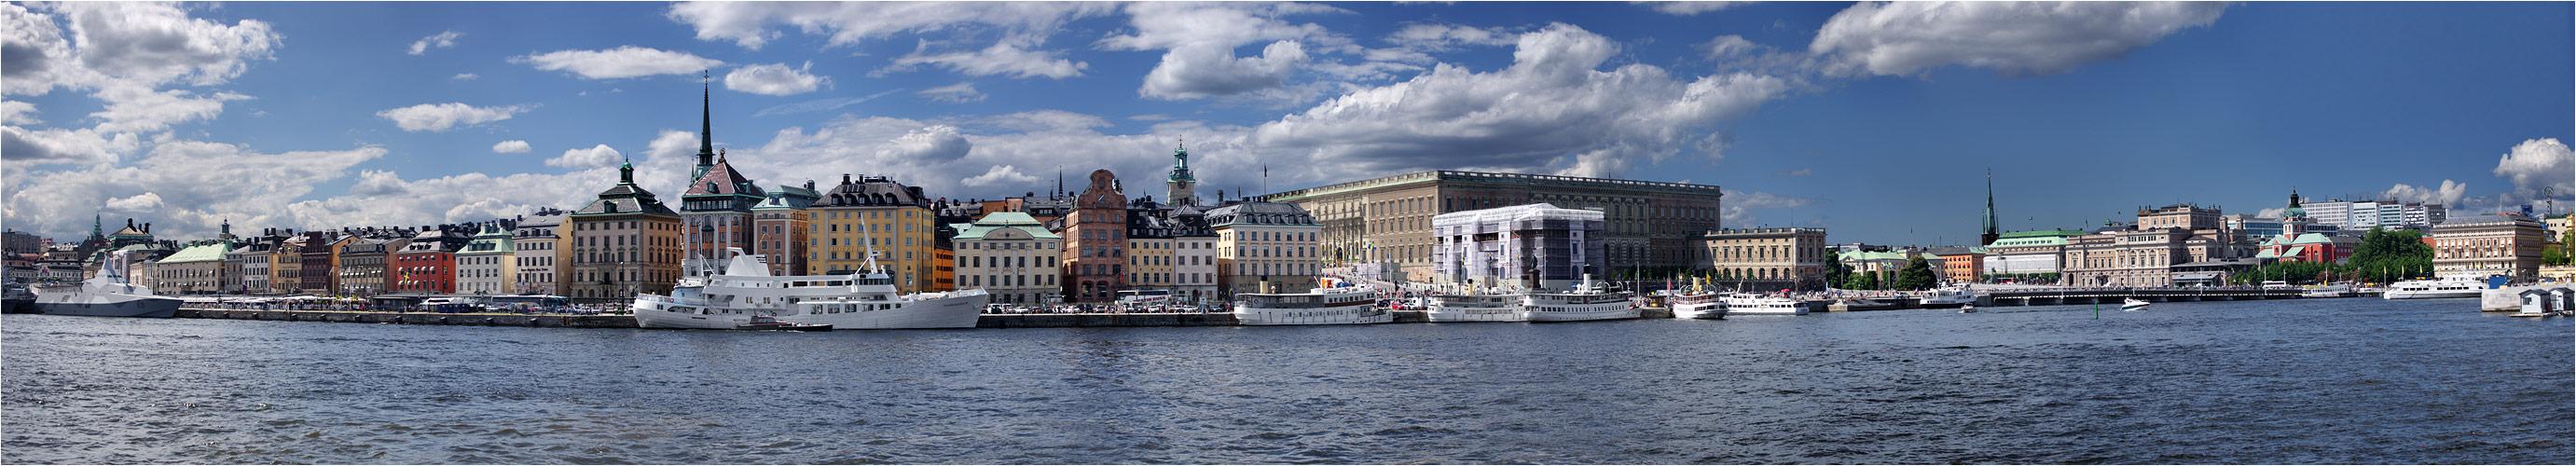 Stockholm 13 27